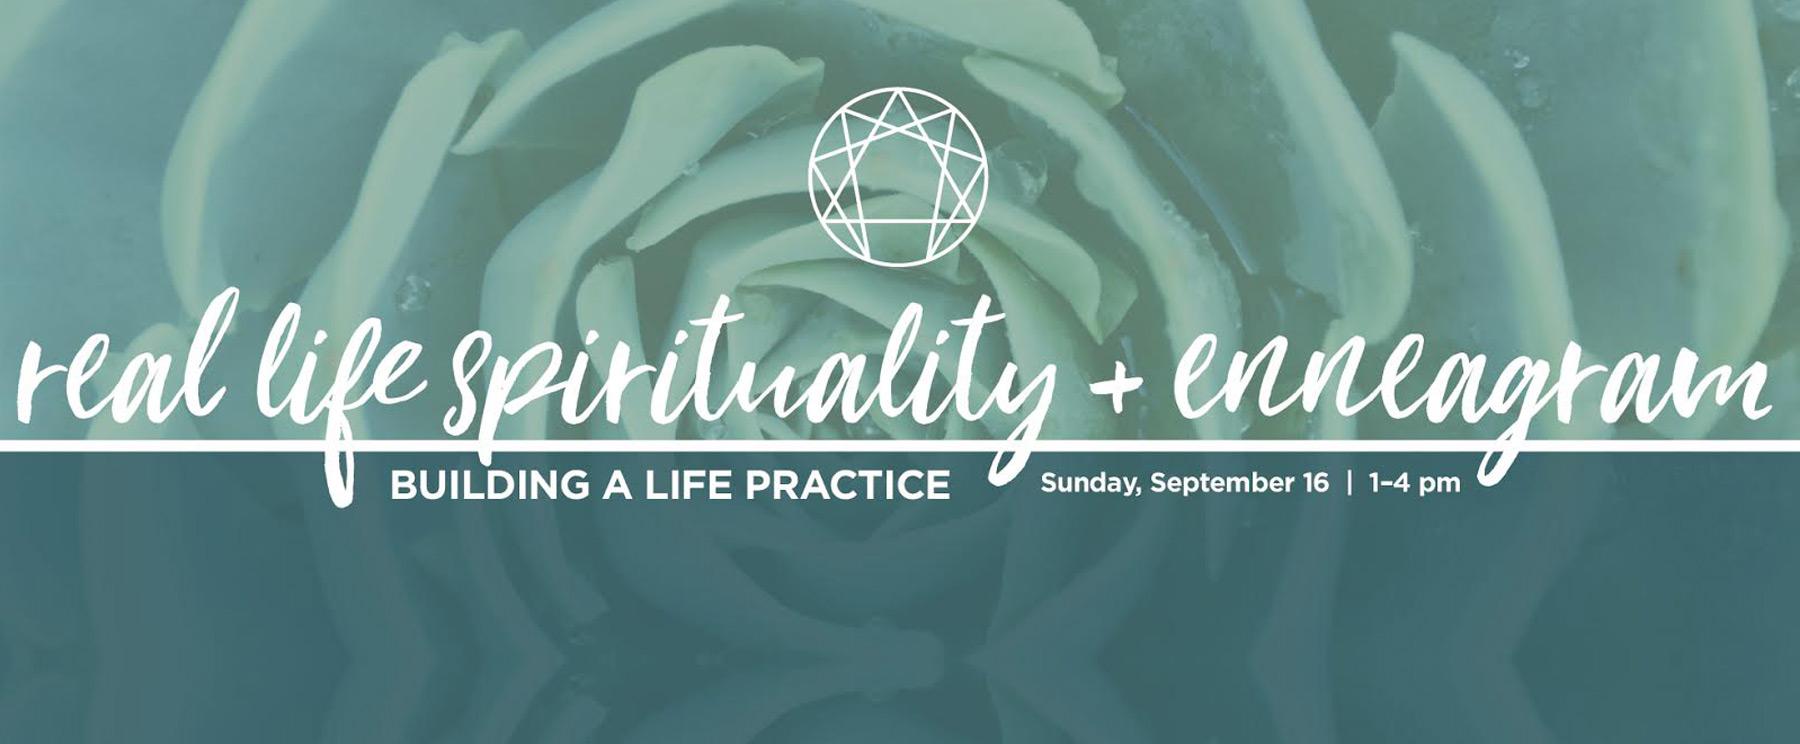 spirituality-enneagram-1